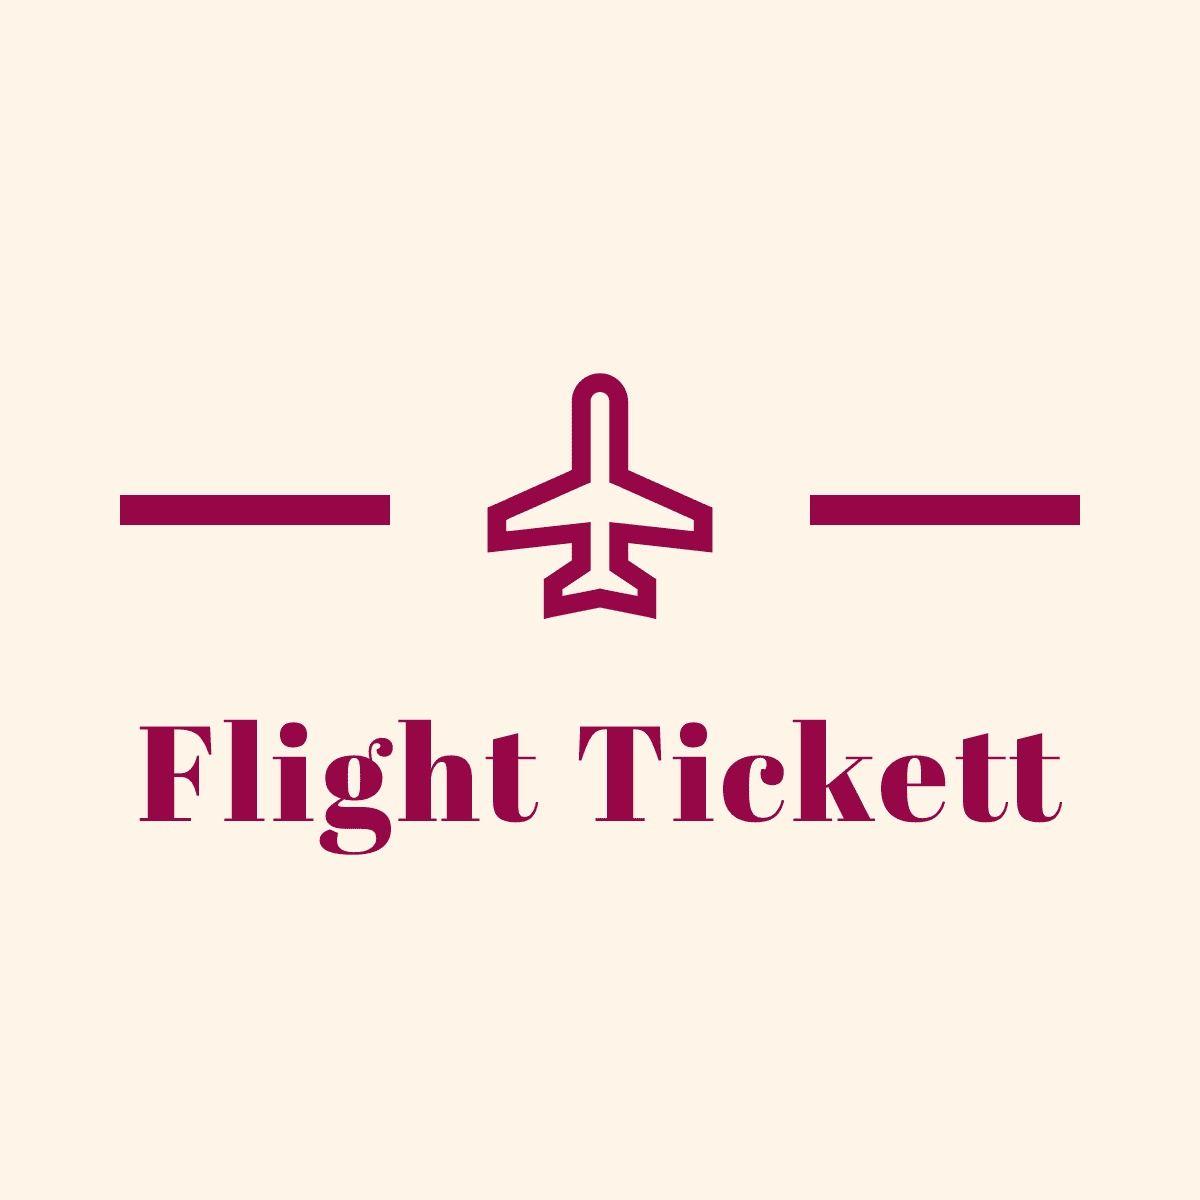 Cheap air flights cheap last minute flights bikini